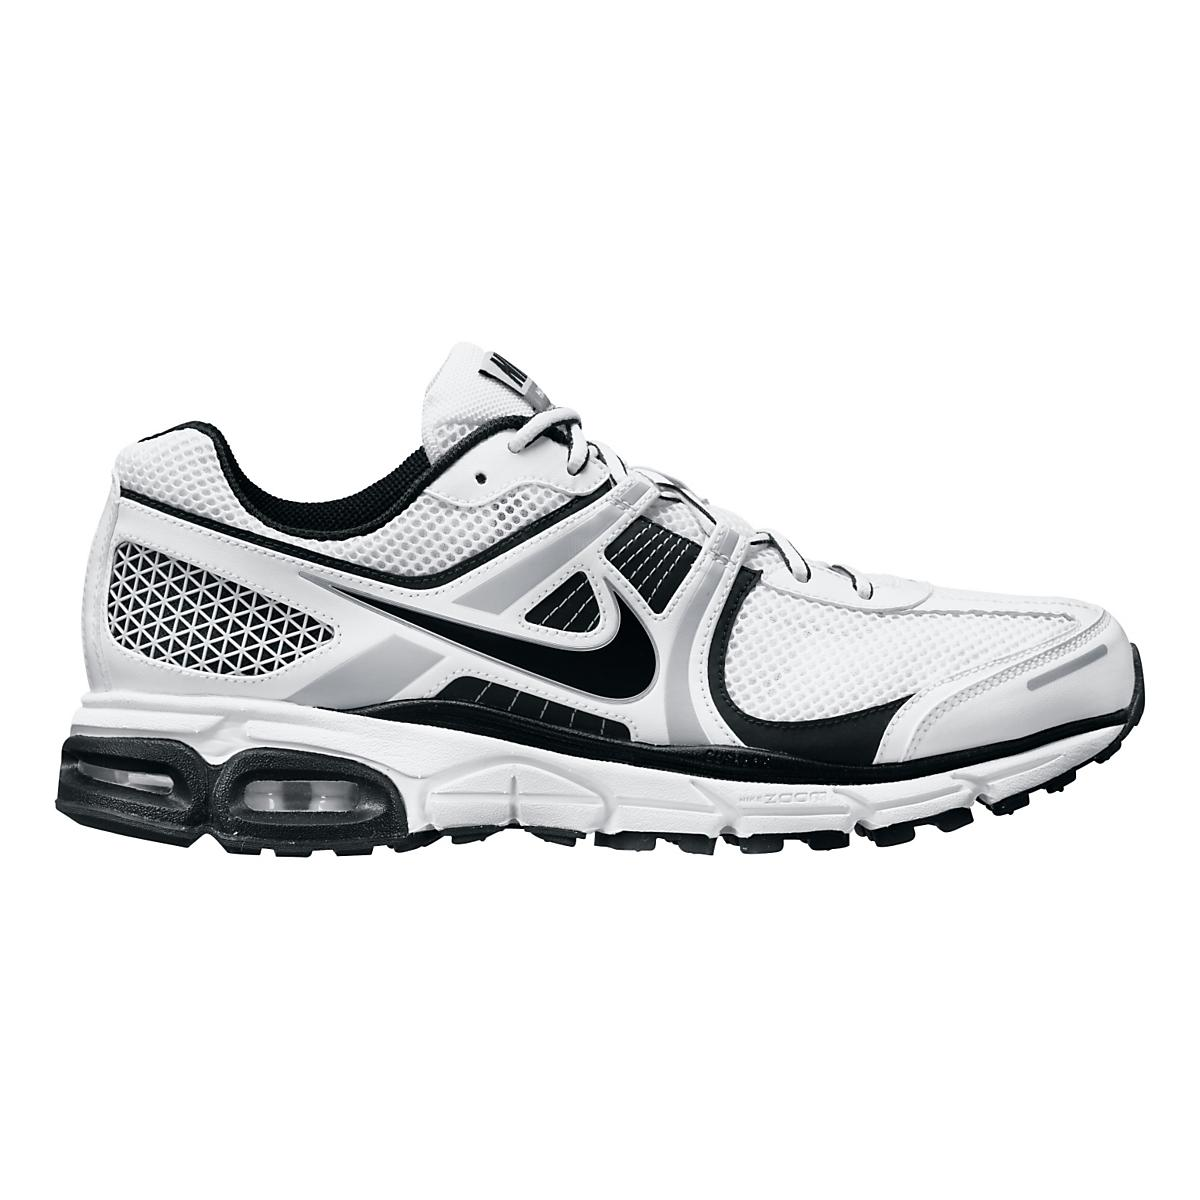 half off 7e4b3 506a8 Mens Nike Air Max Moto+ 8 Running Shoe at Road Runner Sports